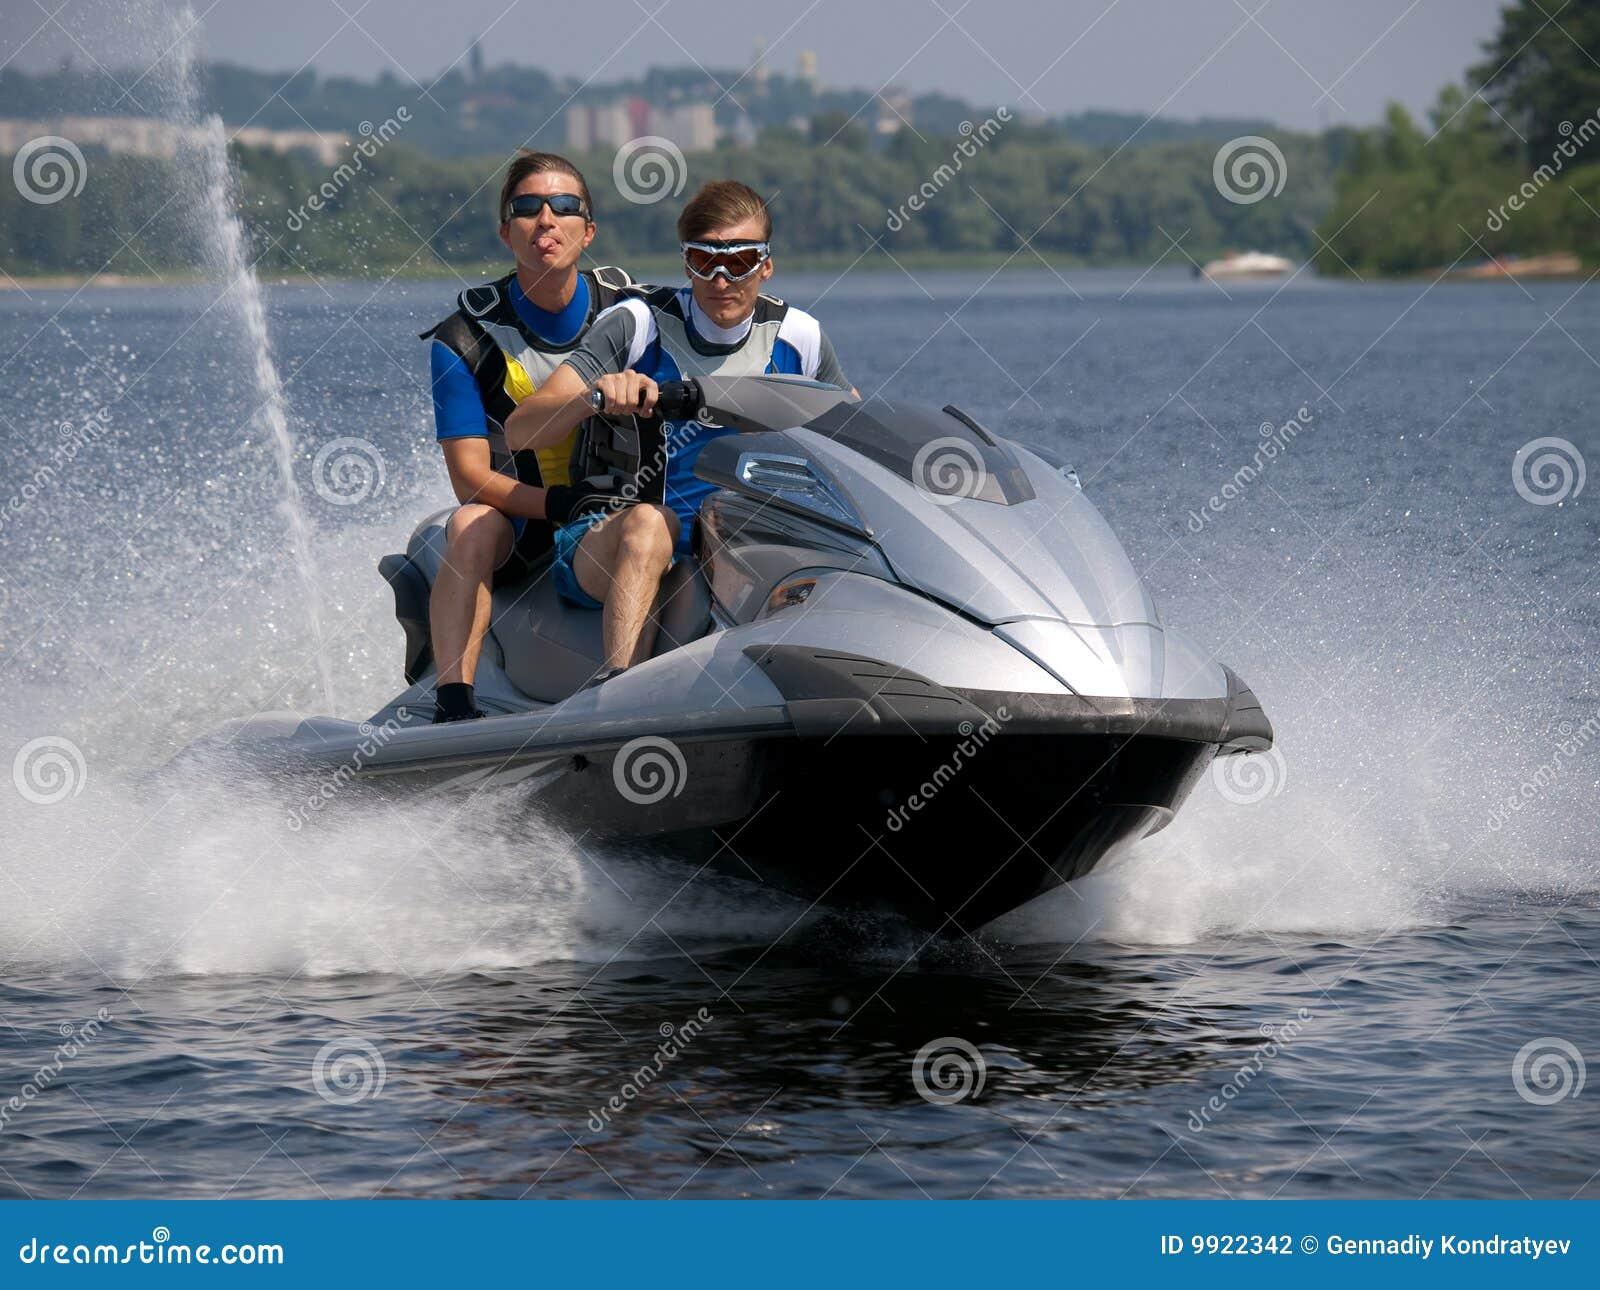 Ihram Kids For Sale Dubai: Couple Men On Jet Ski In The River Stock Photography